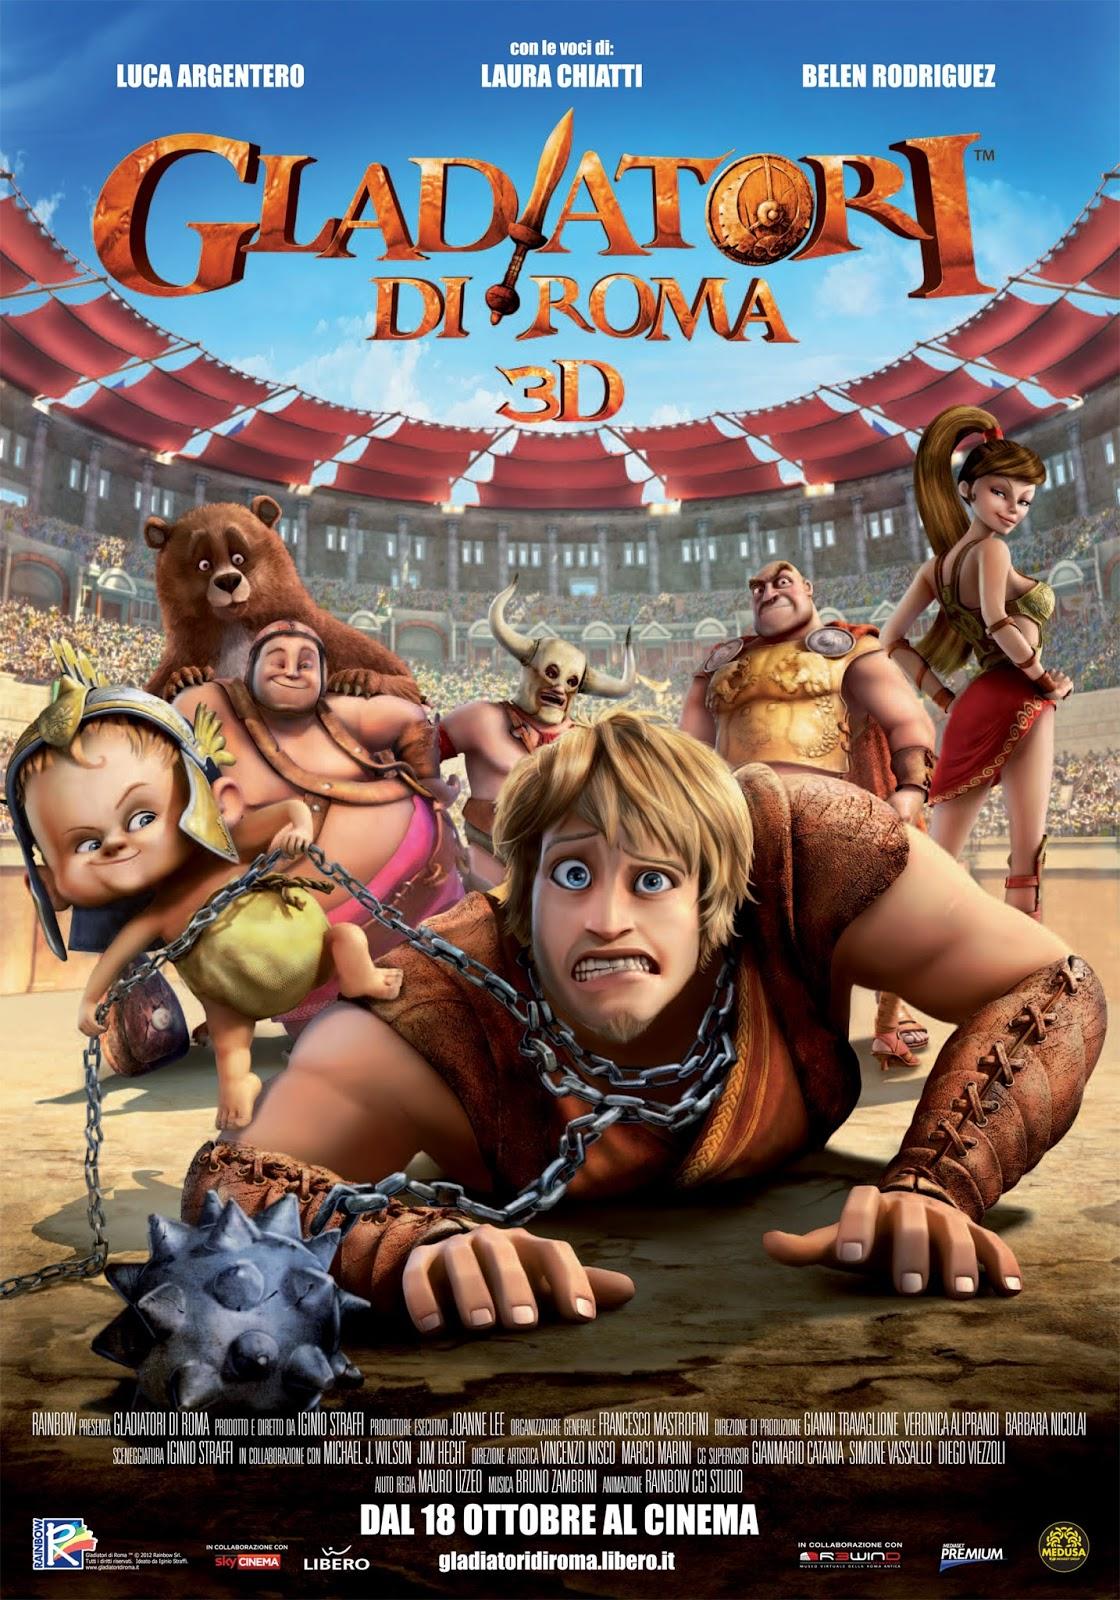 Ver Gladiatori Di Roma (2012) Online